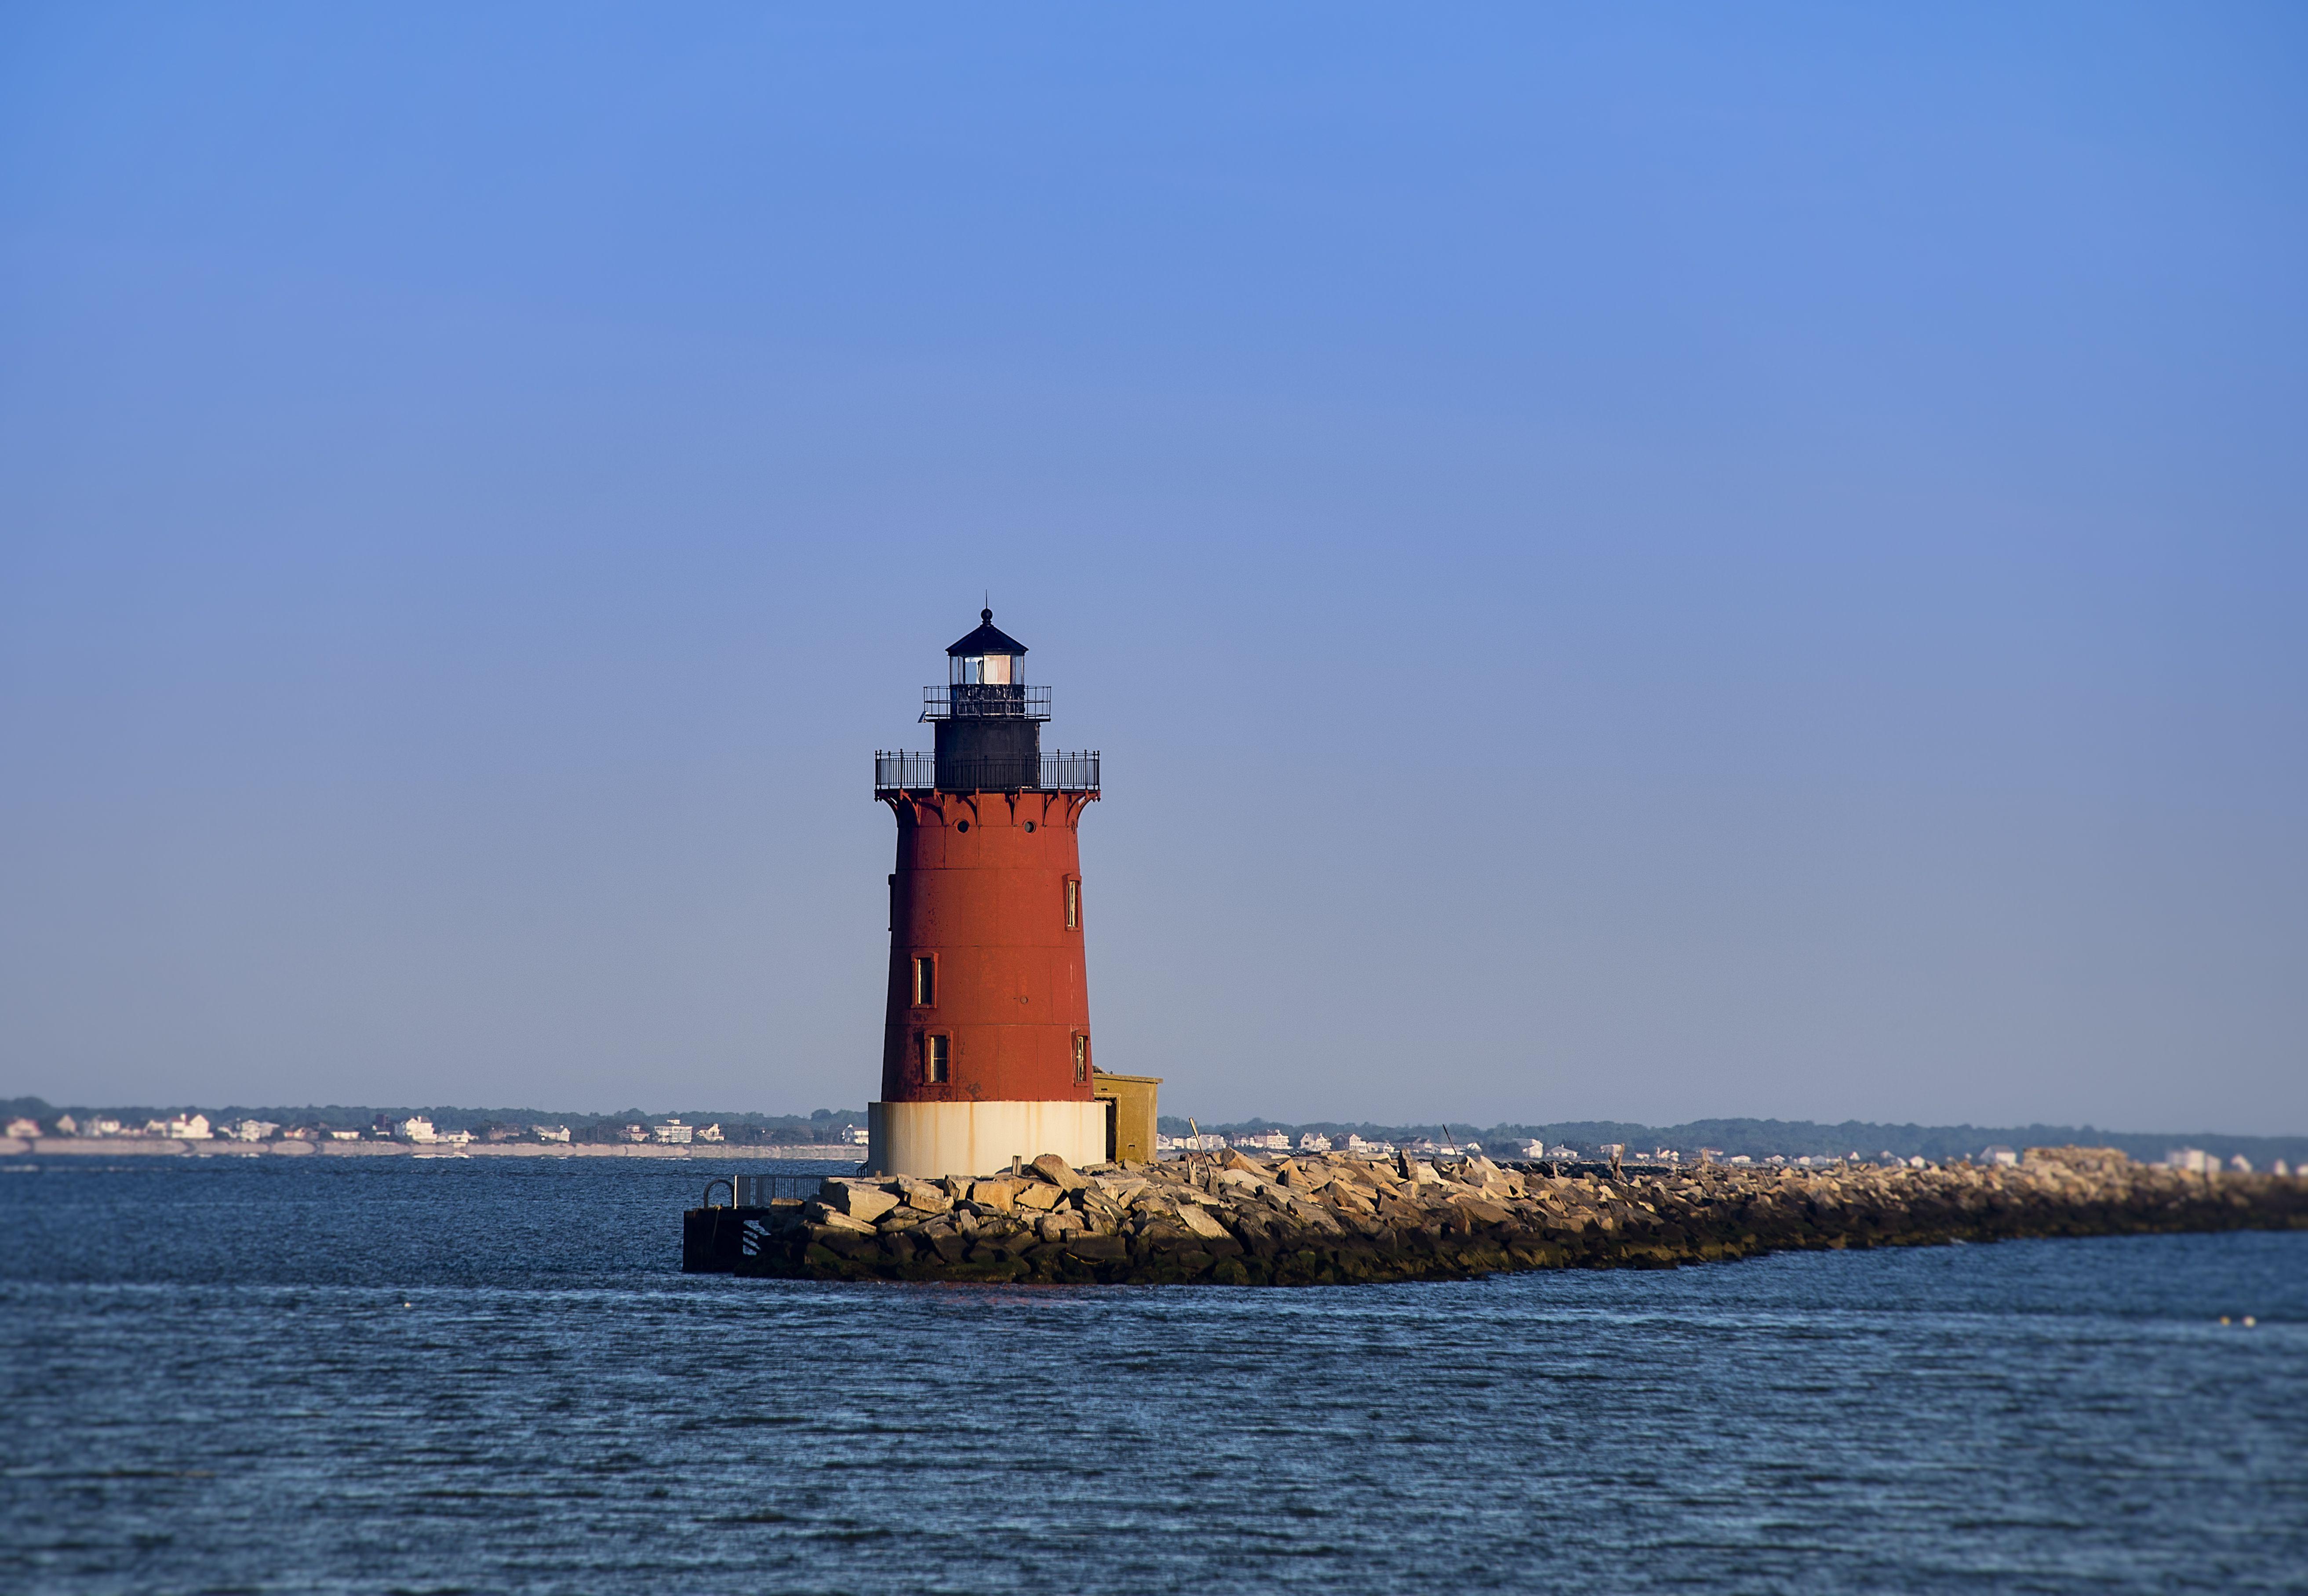 Delaware Breakwater Lighthouse in Lewes, Delaware